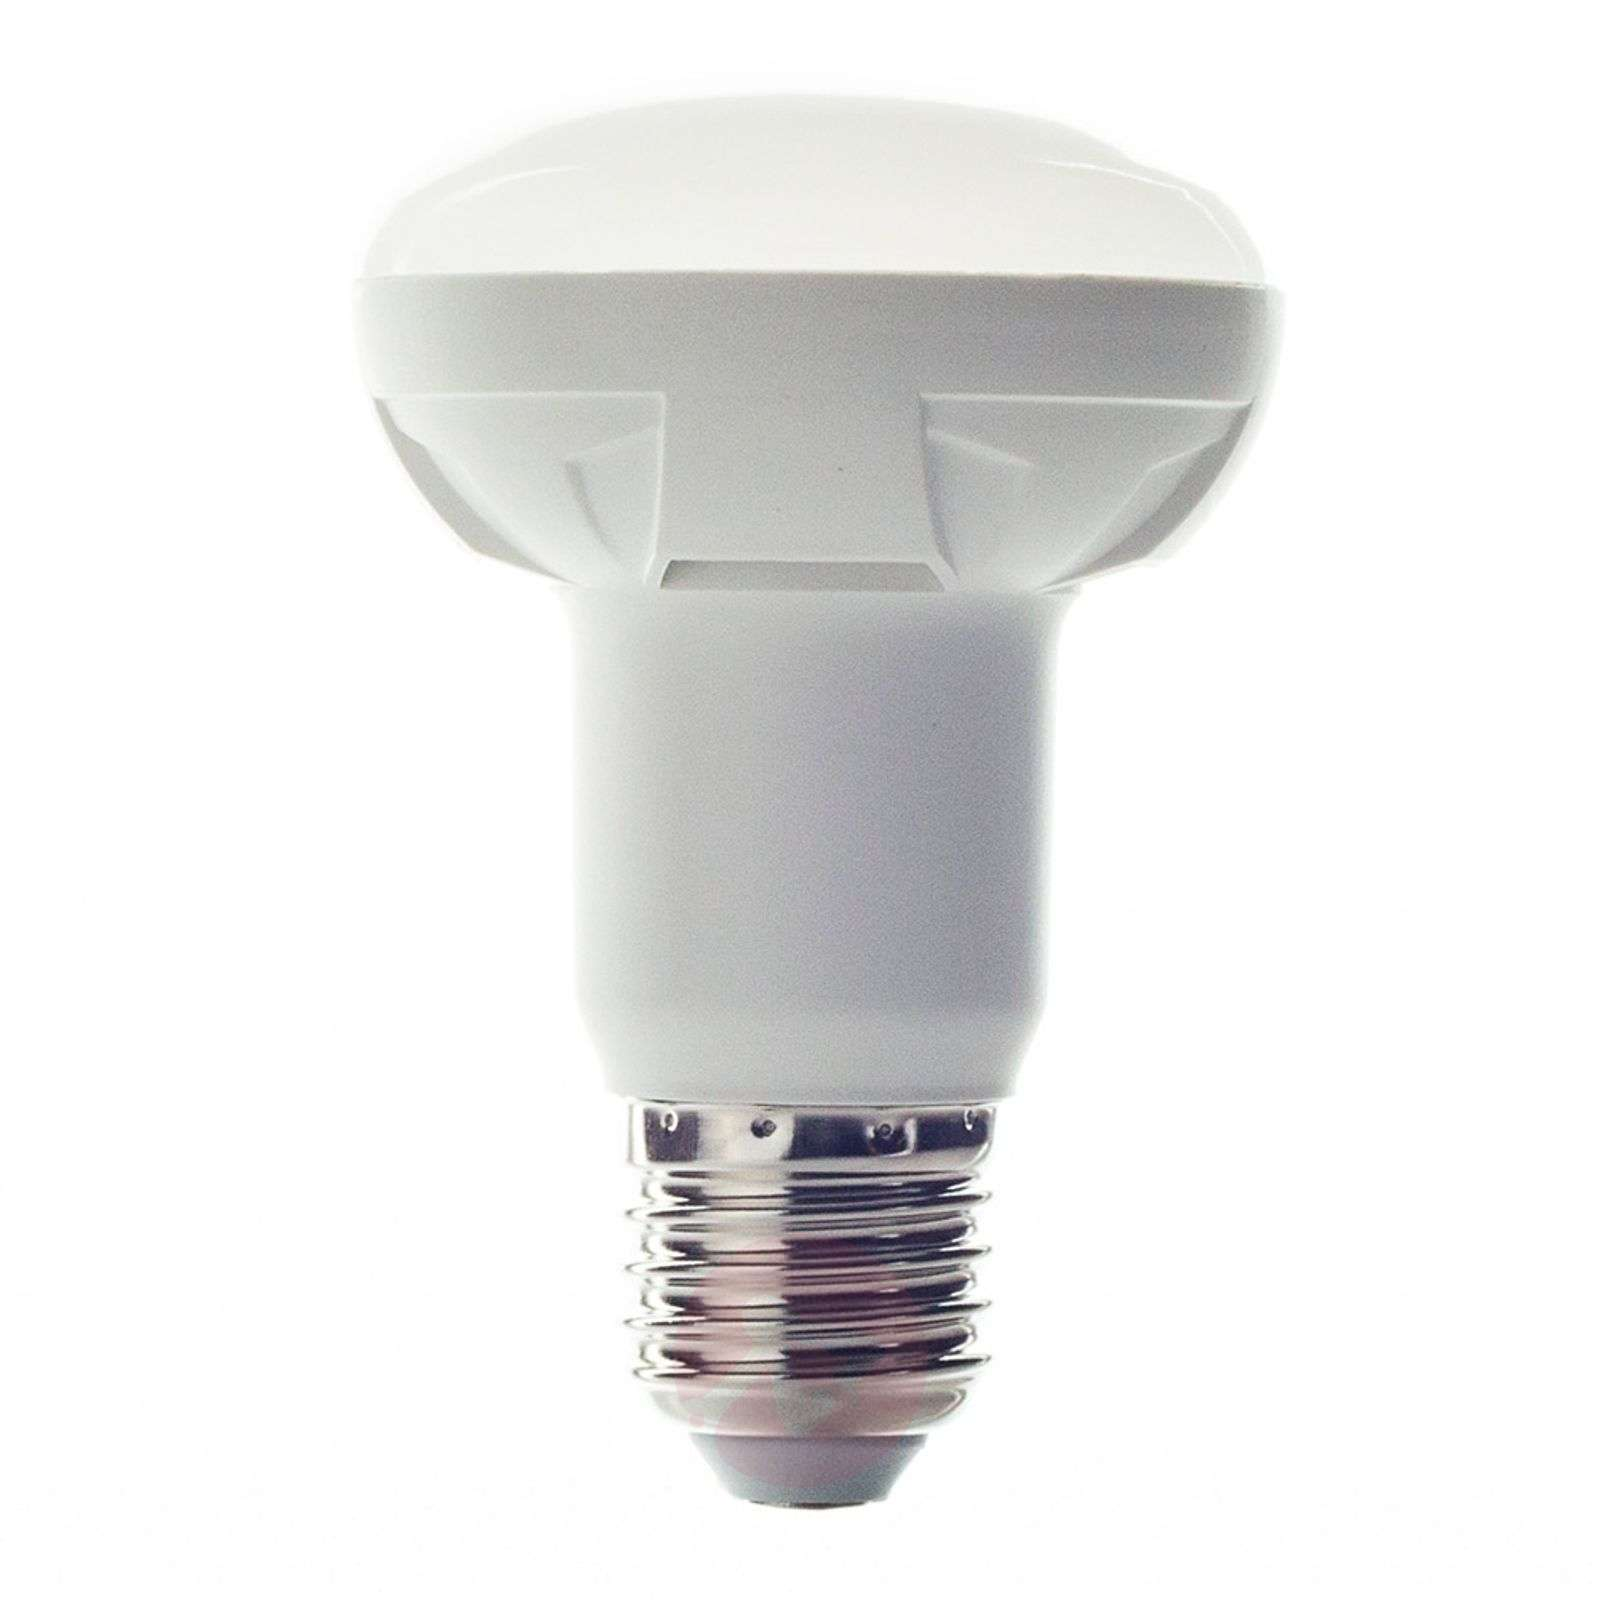 LED-heijastinlamppu R63 E27 11 W 830, valk., 120degree-9993006-02